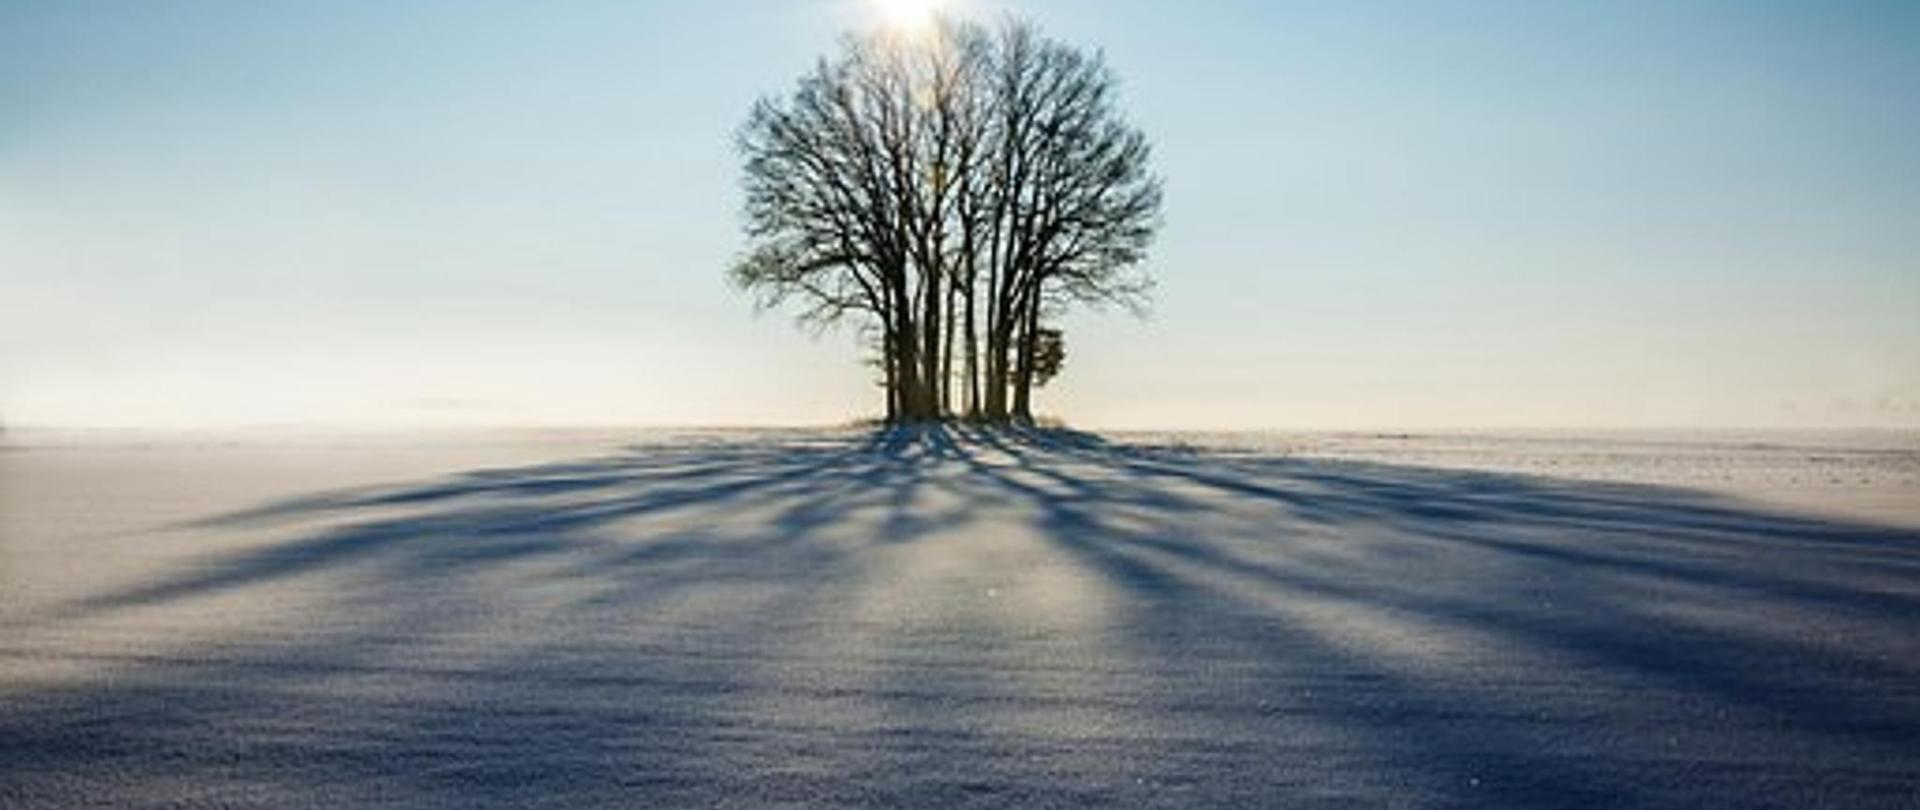 winter-1965902__340.jpg